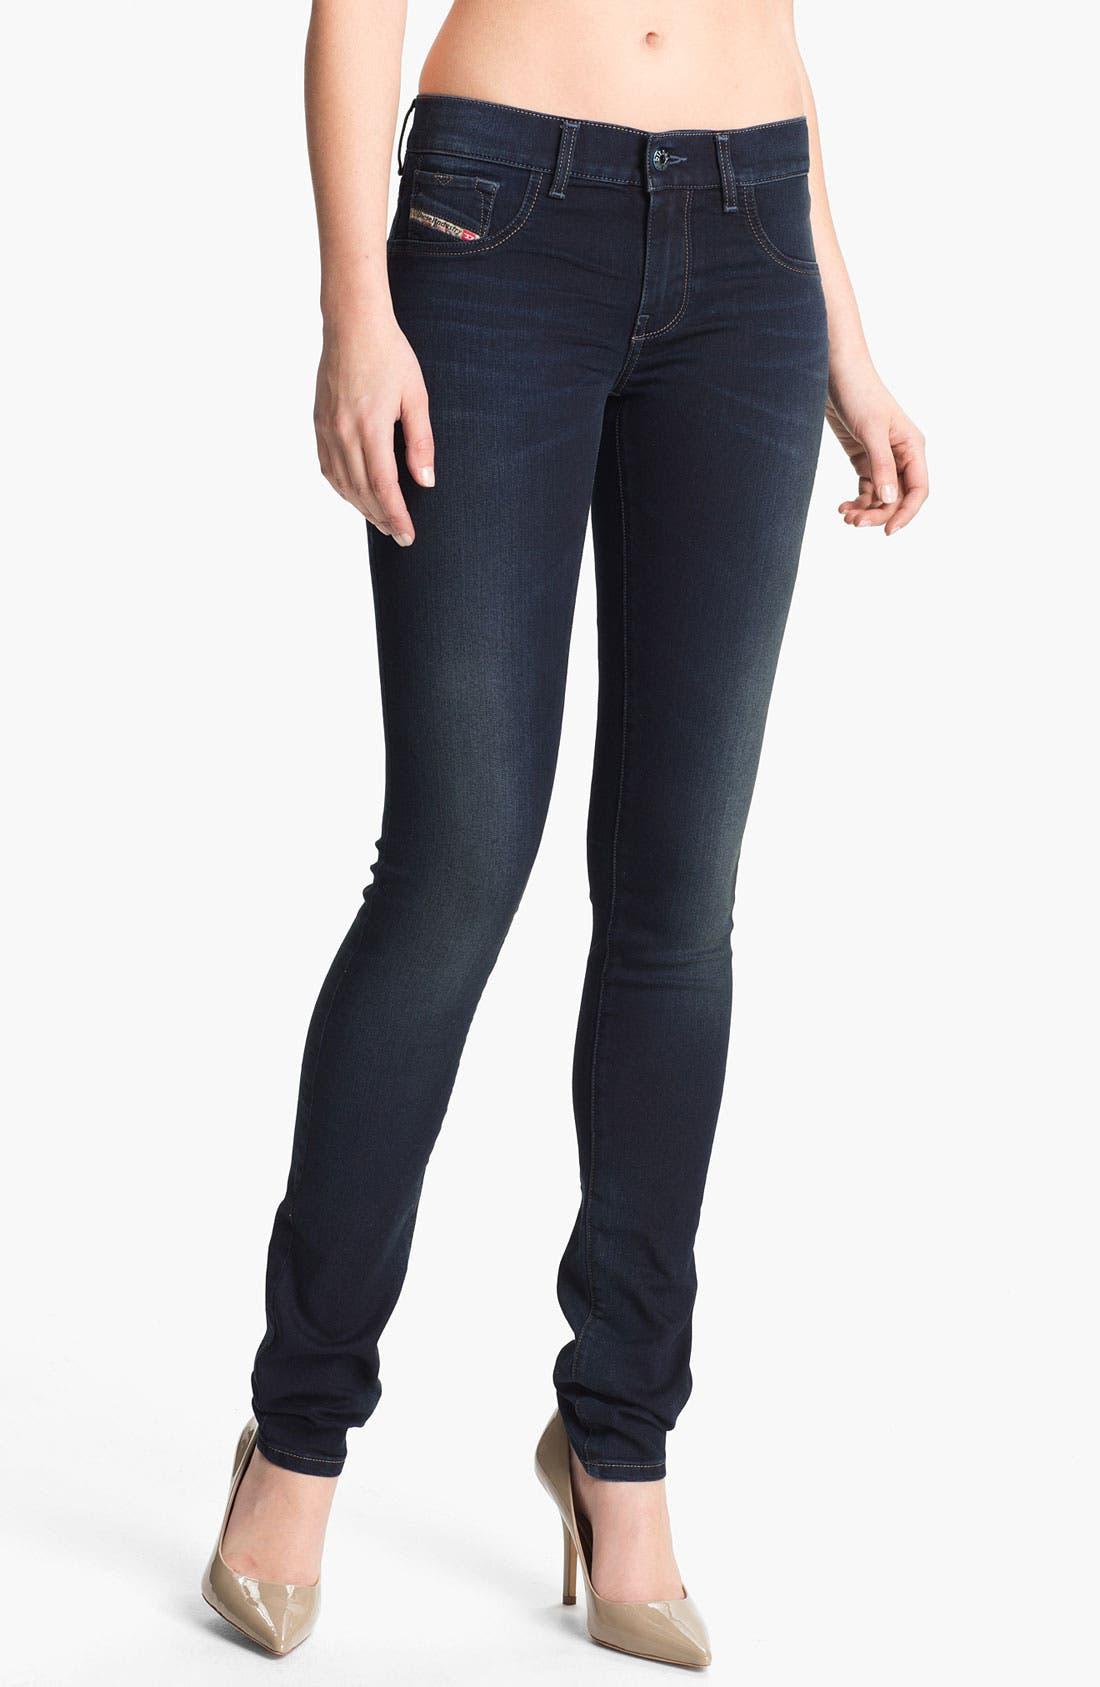 Alternate Image 1 Selected - DIESEL® 'Livier' Stretch Denim Skinny Jeans (Blue)